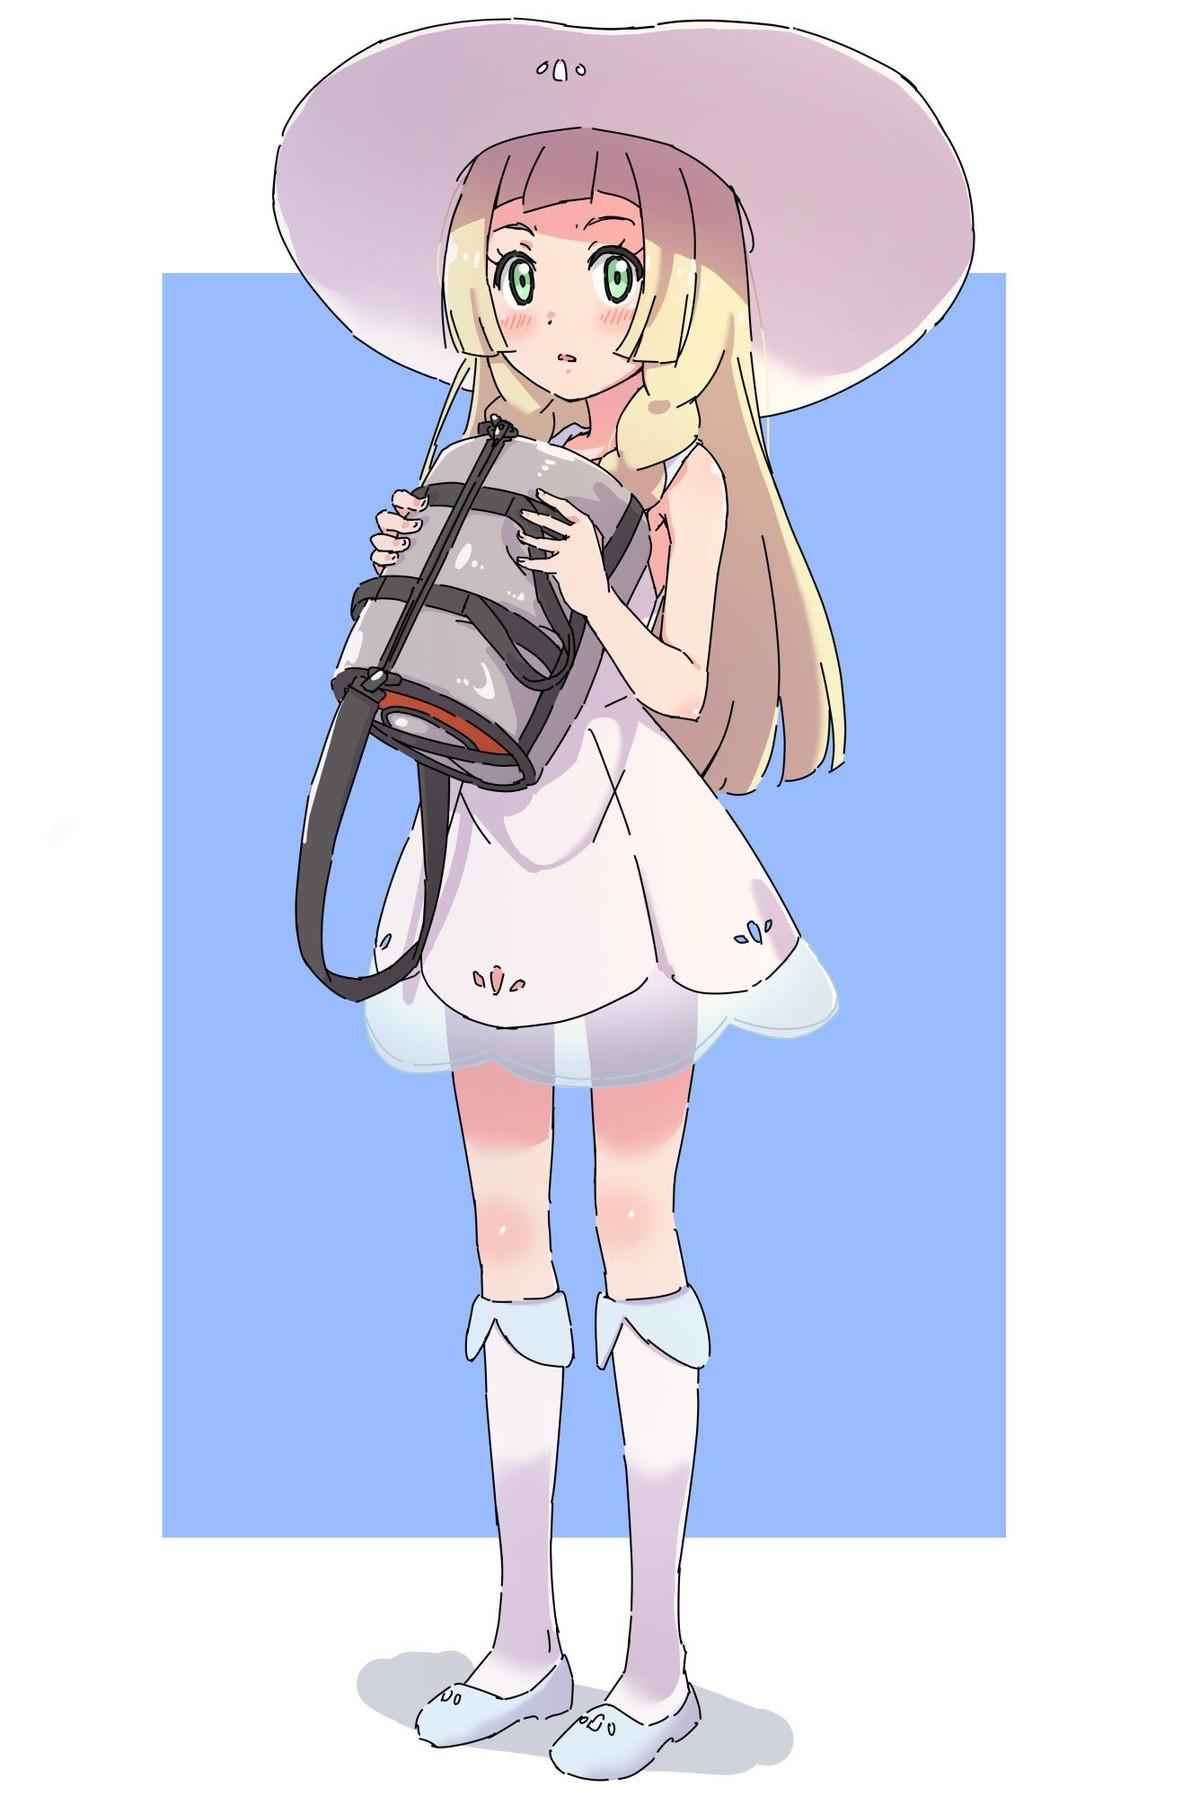 lillie_(pokemon)075